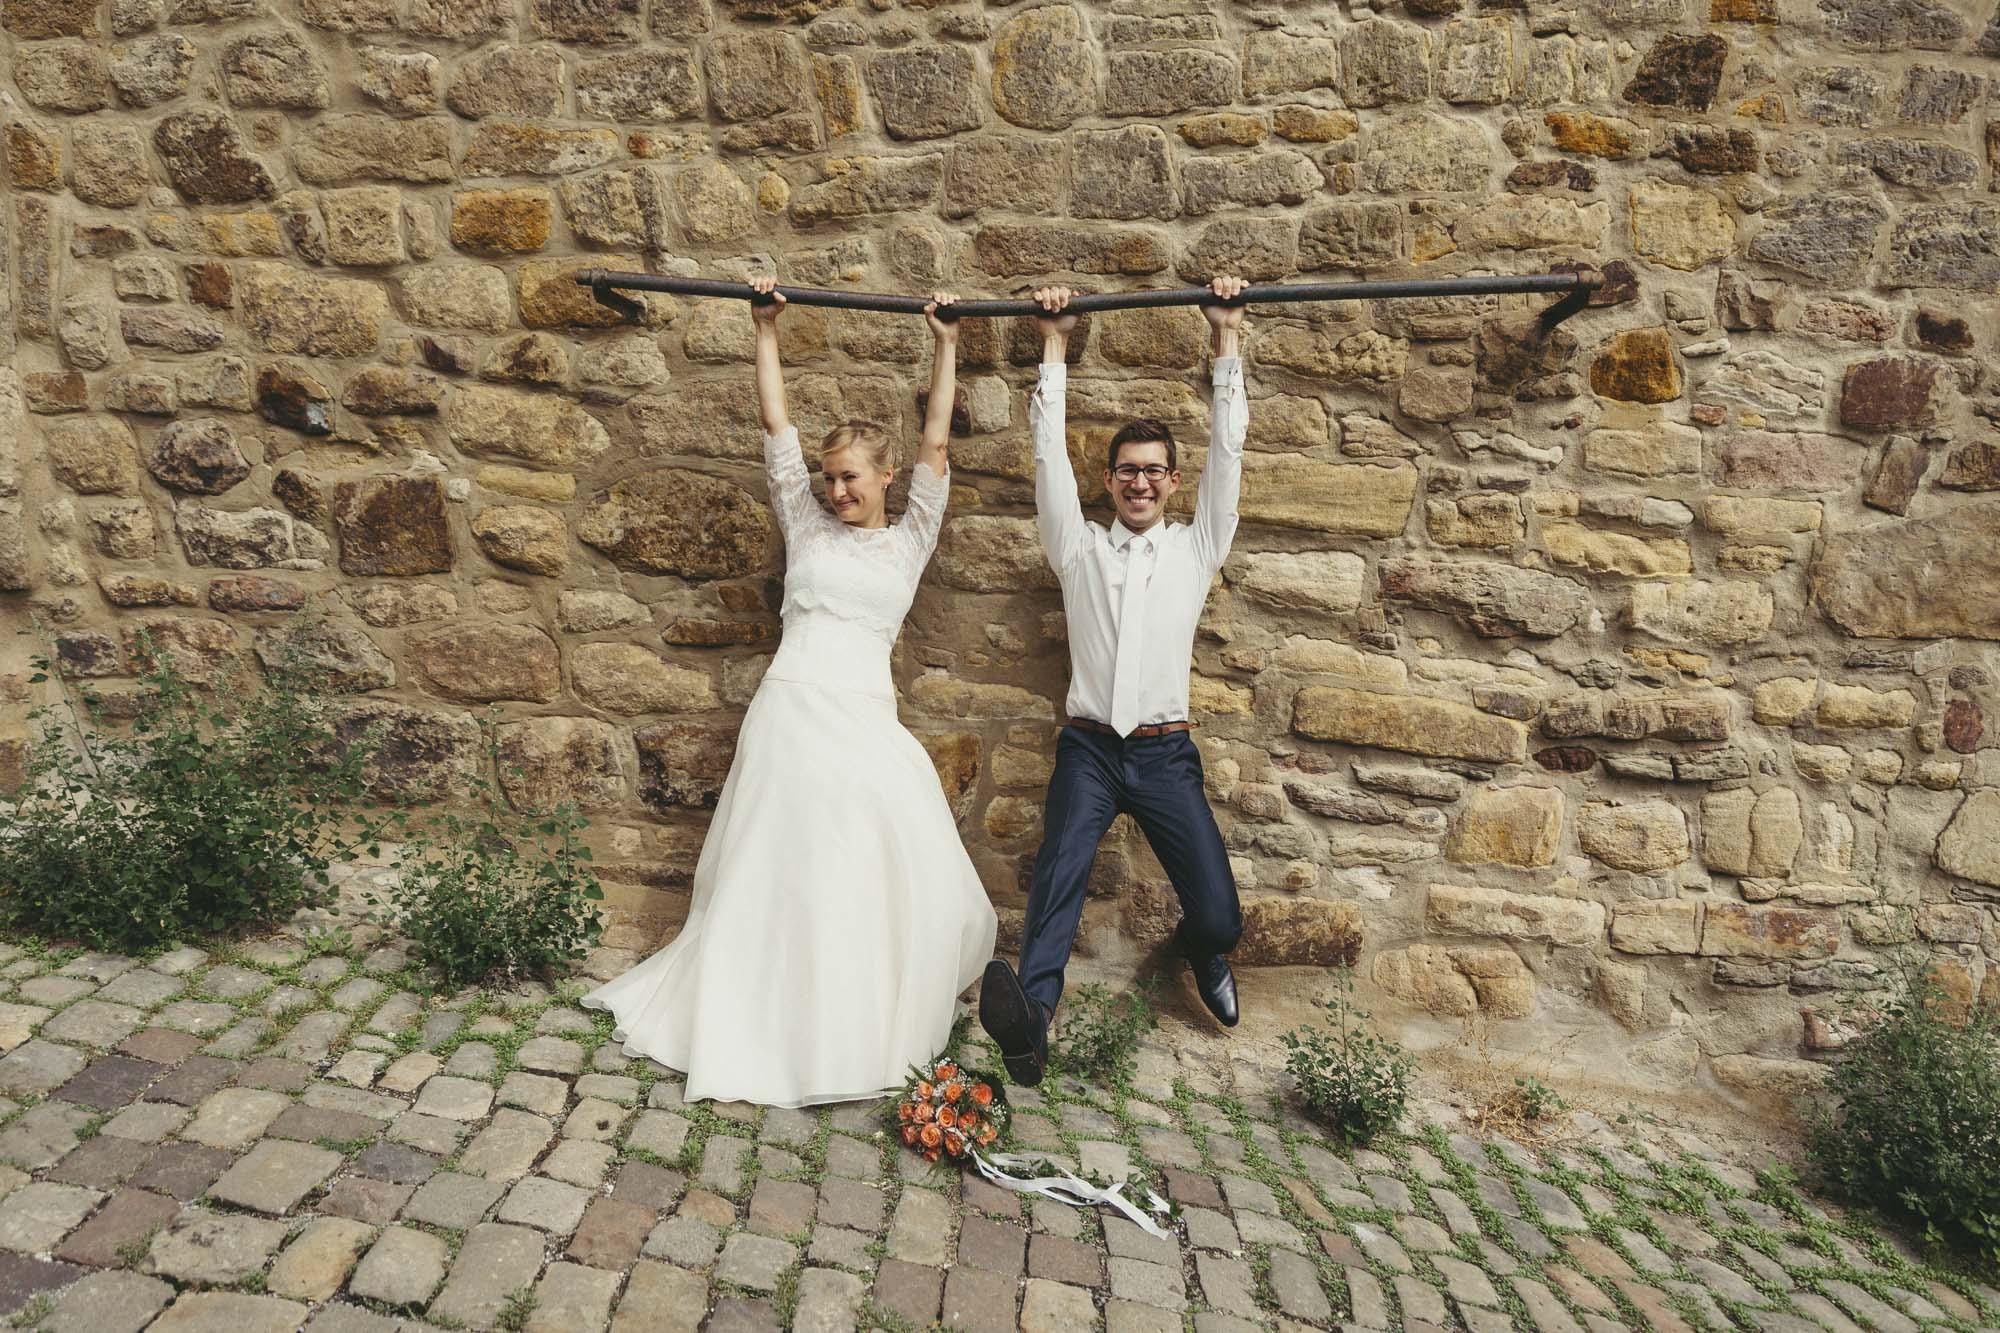 Hochzeitsfotografie-Tuebingen-Doro-Stefan-15